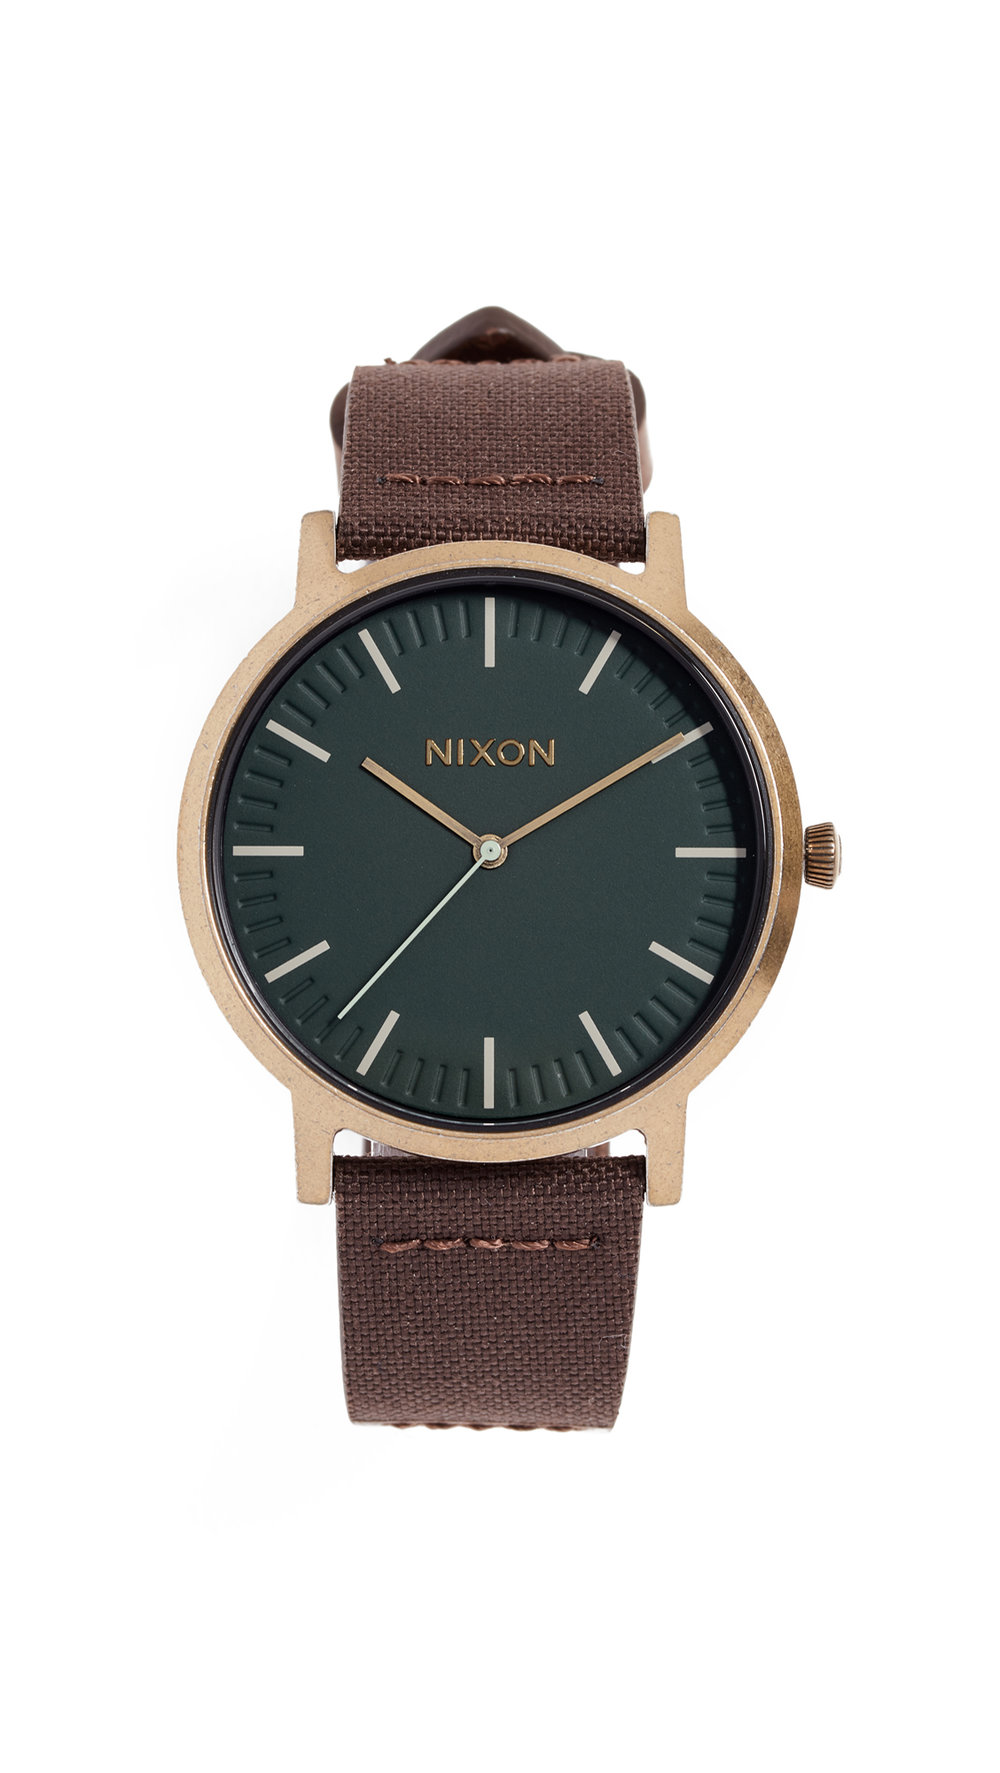 nixon405271128d_m1_2-0.jpg